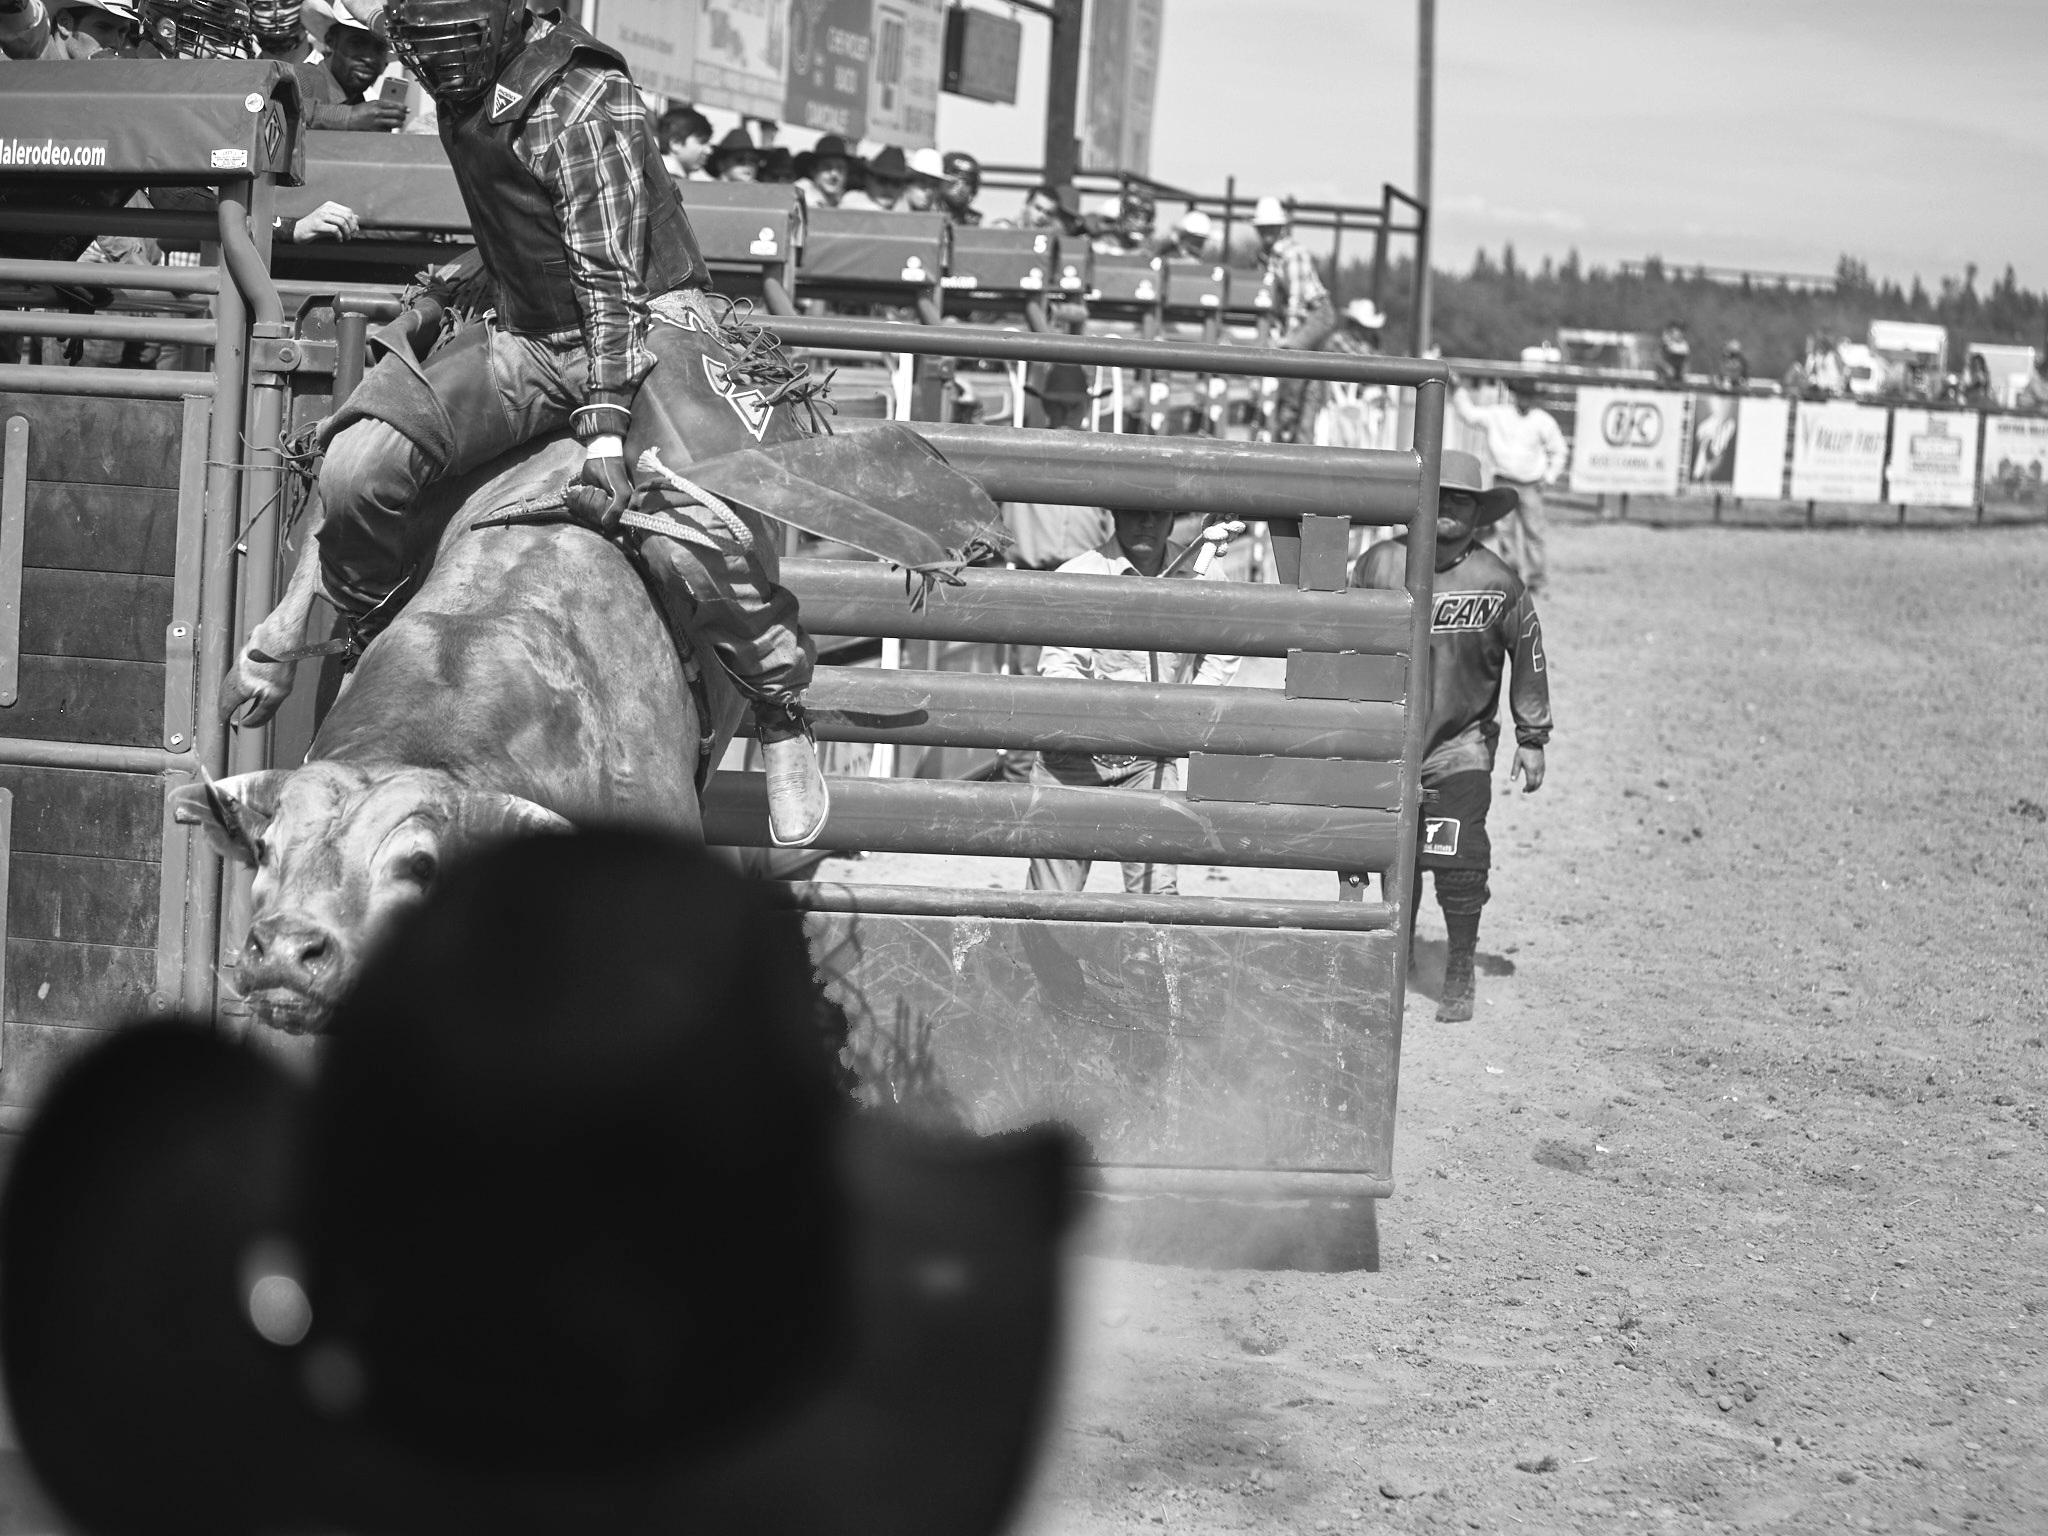 Rodeo_2019_997.jpg